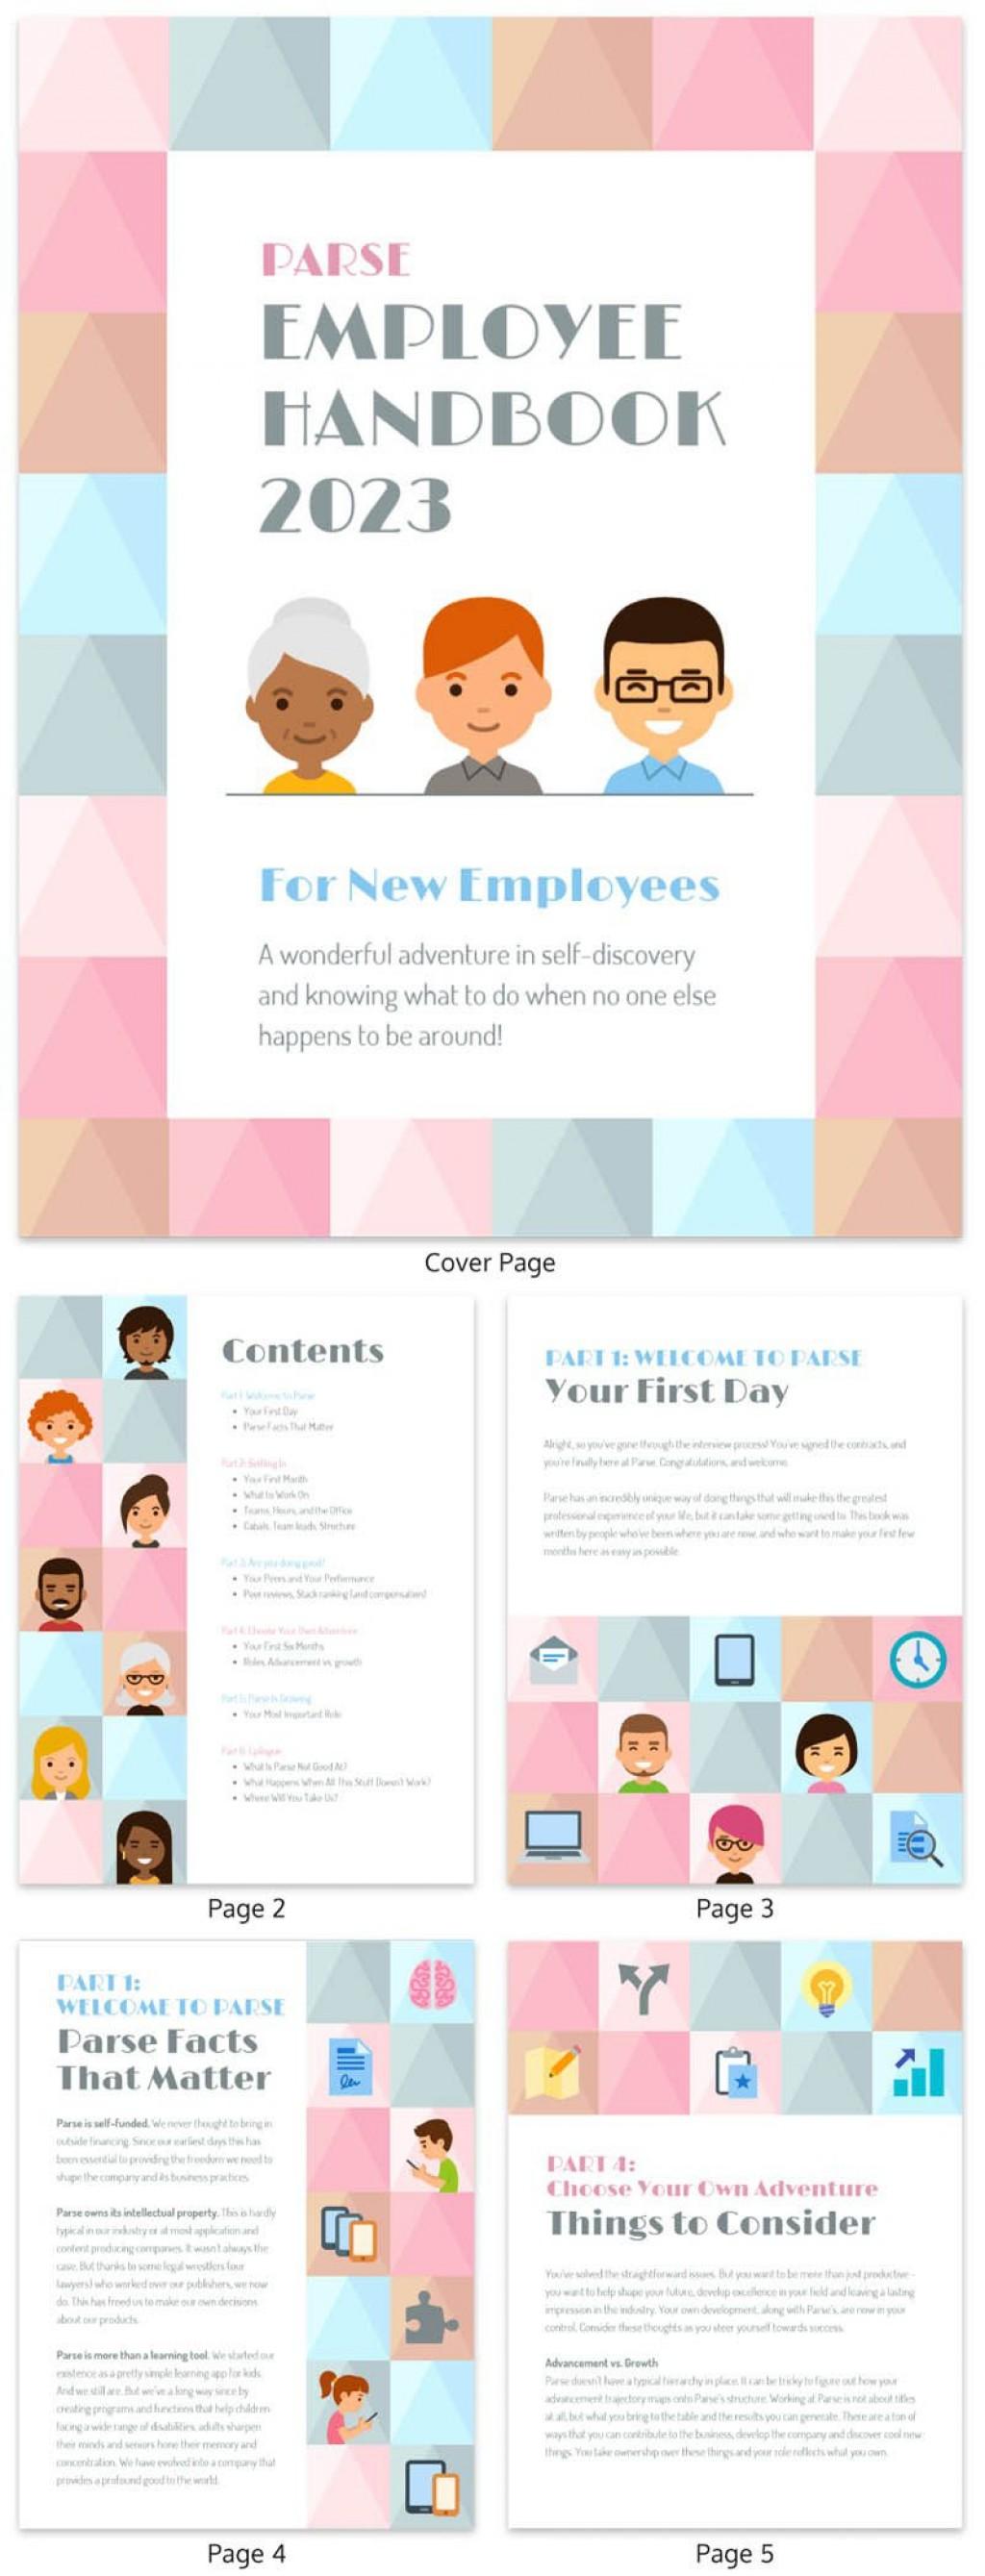 008 Striking Free Employment Handbook Template High Definition Large